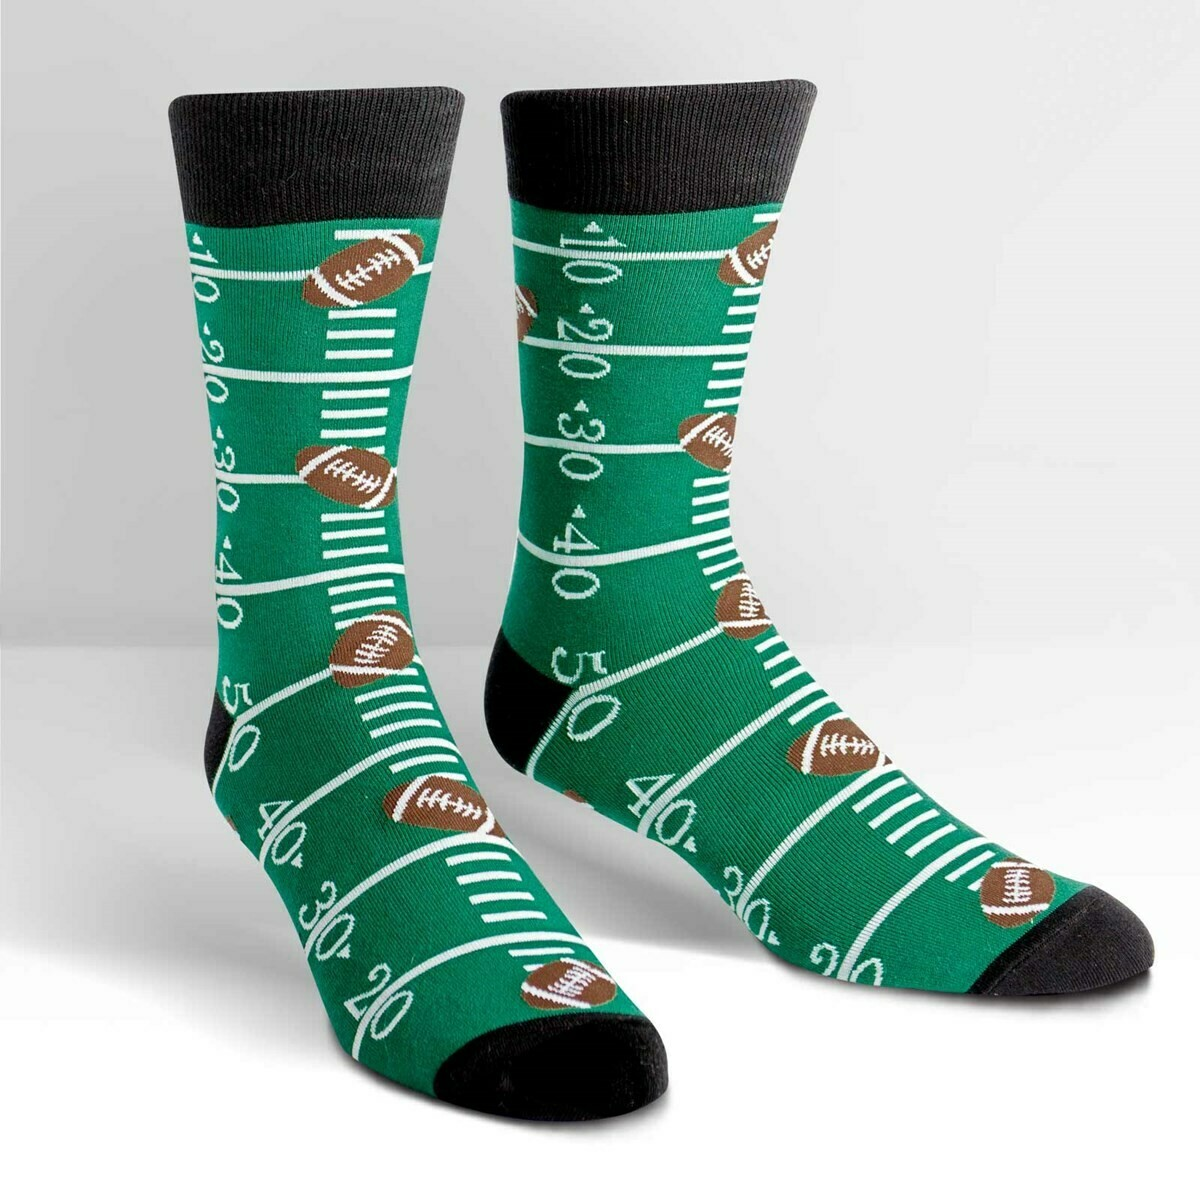 Sock it to Me - Mens Socks